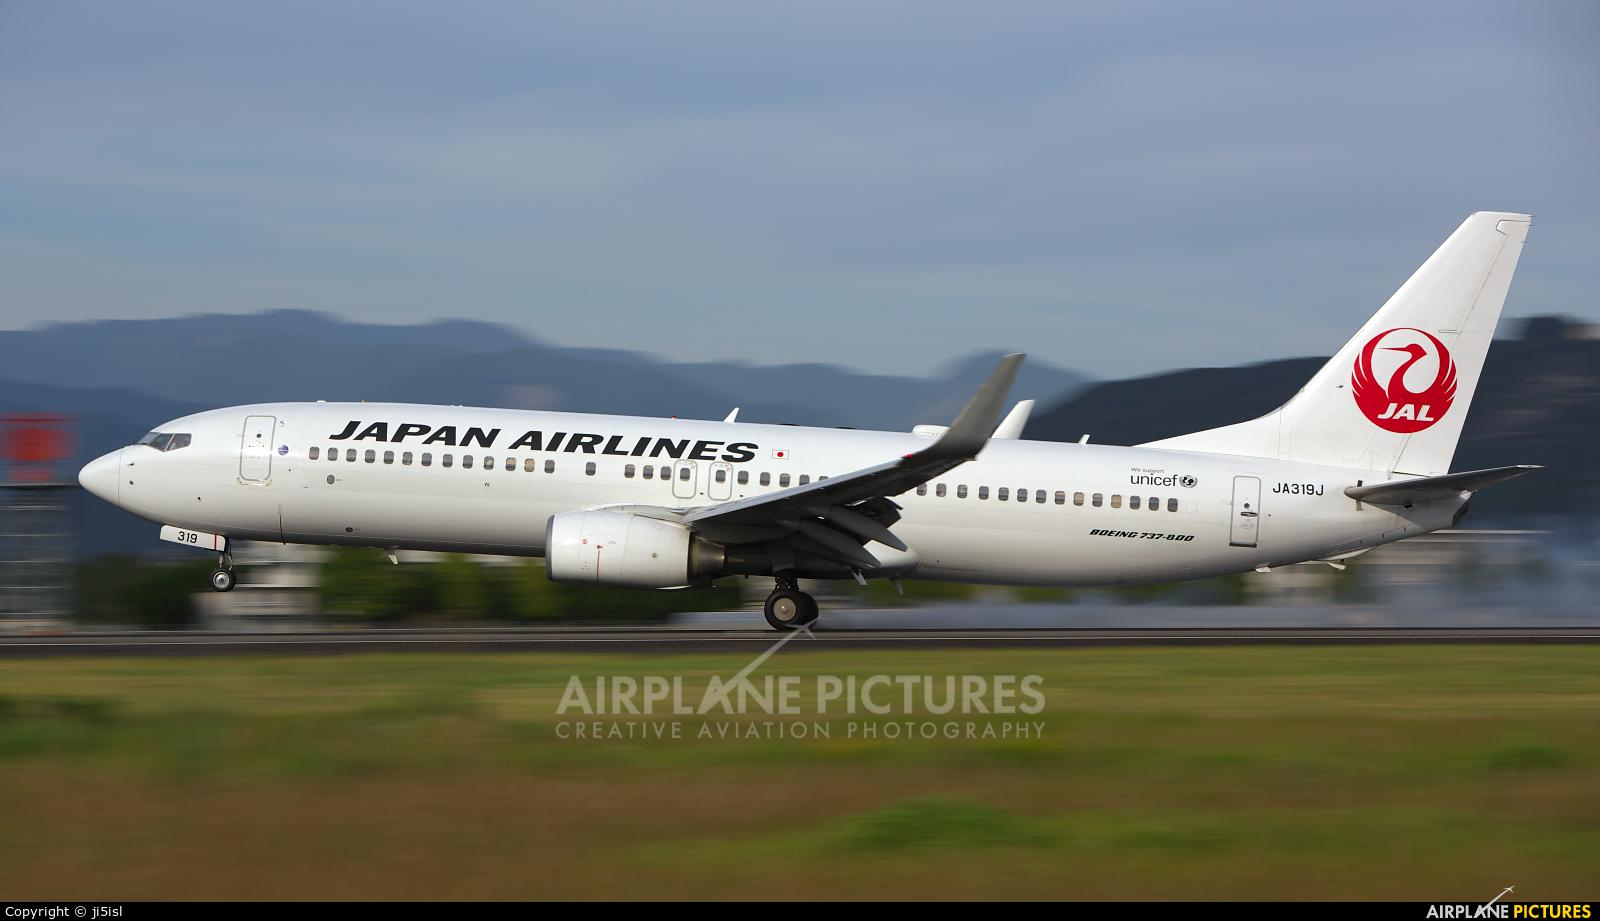 JAL - Japan Airlines JA319J aircraft at Kōchi